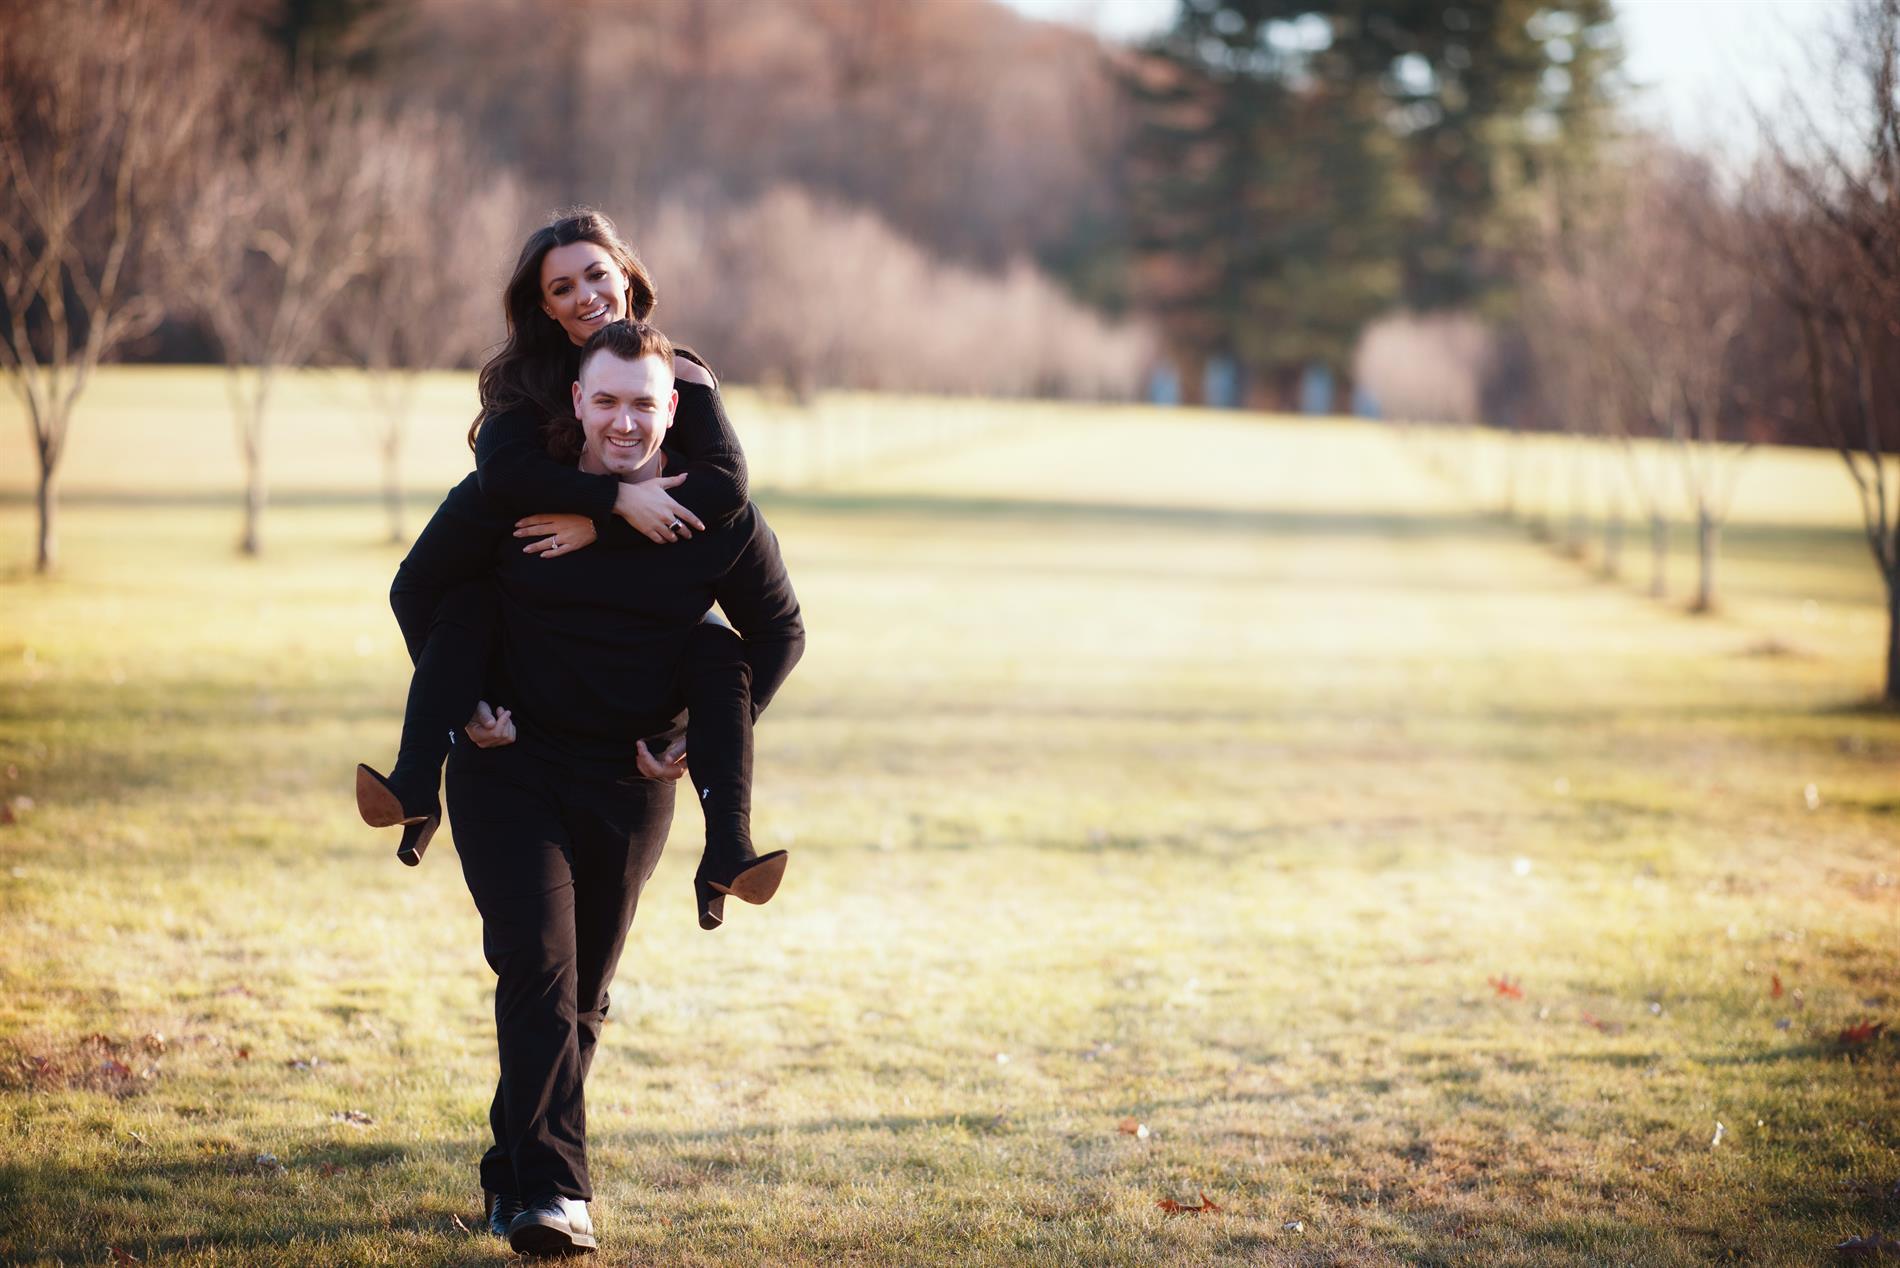 Darryl and Stephanie Engagement Photos